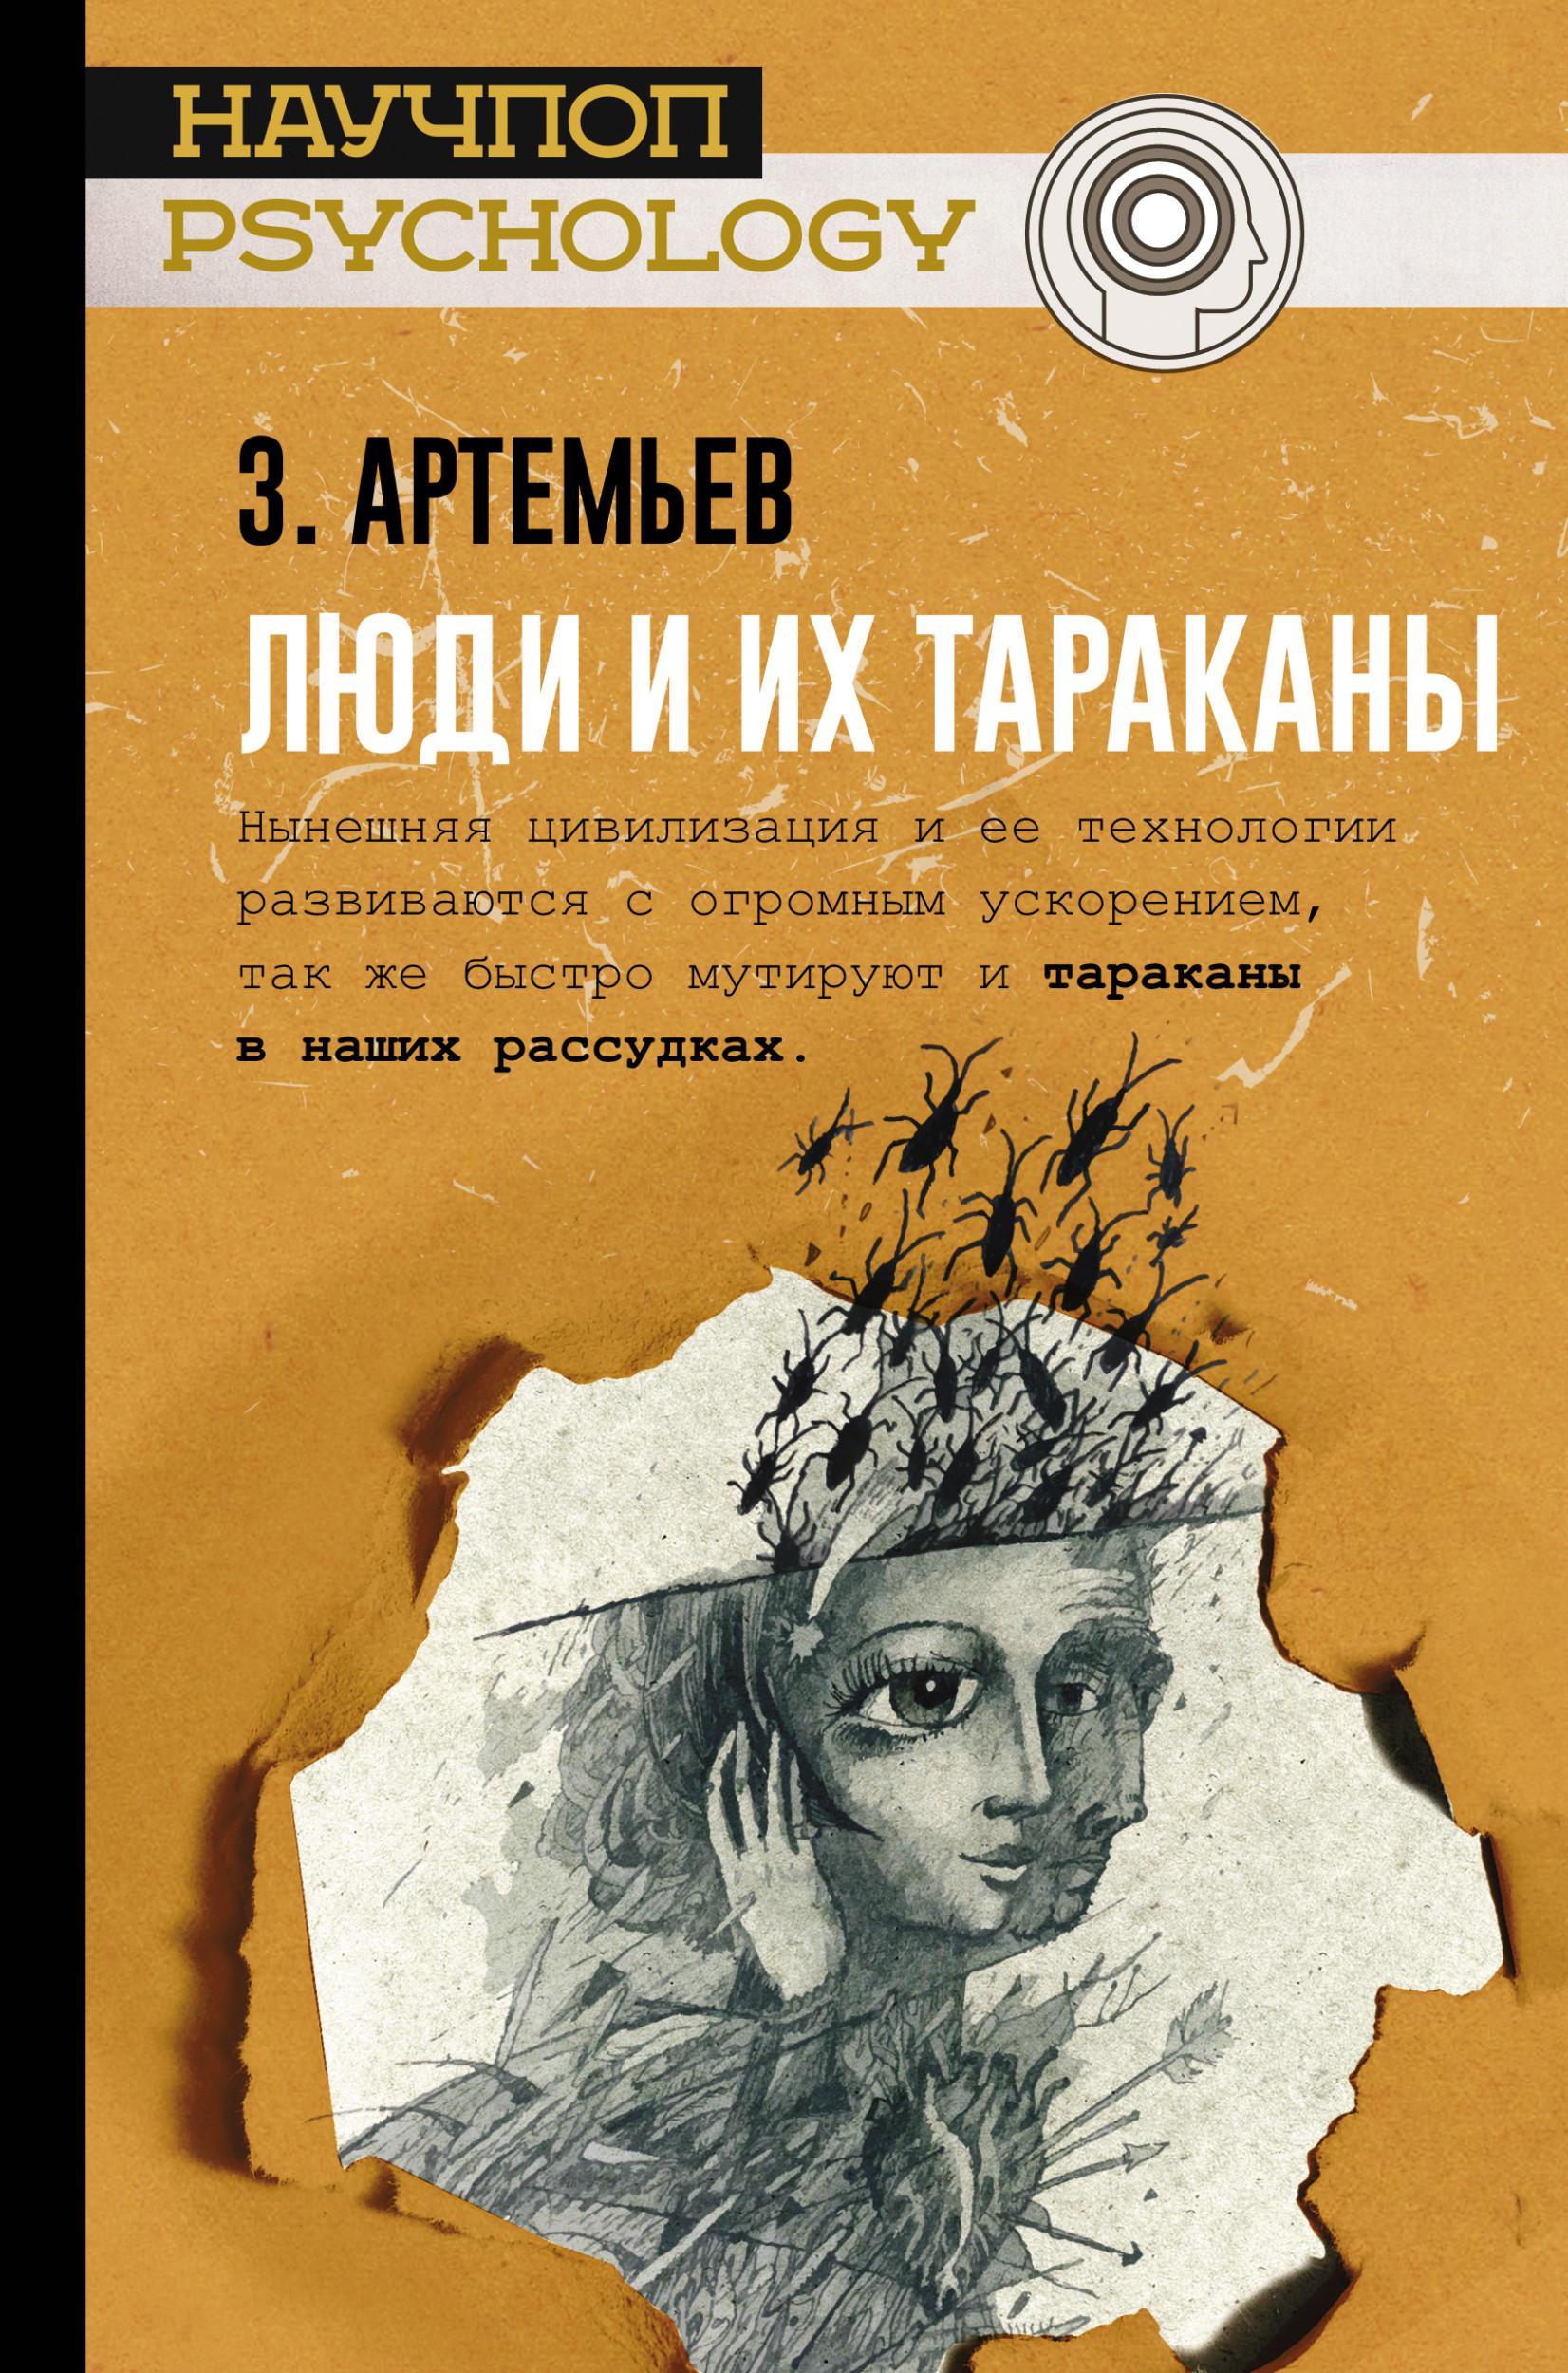 http://chelib.ru/wp-content/uploads/img/books/Артемьев.-Люди-и-их-тараканы.jpg